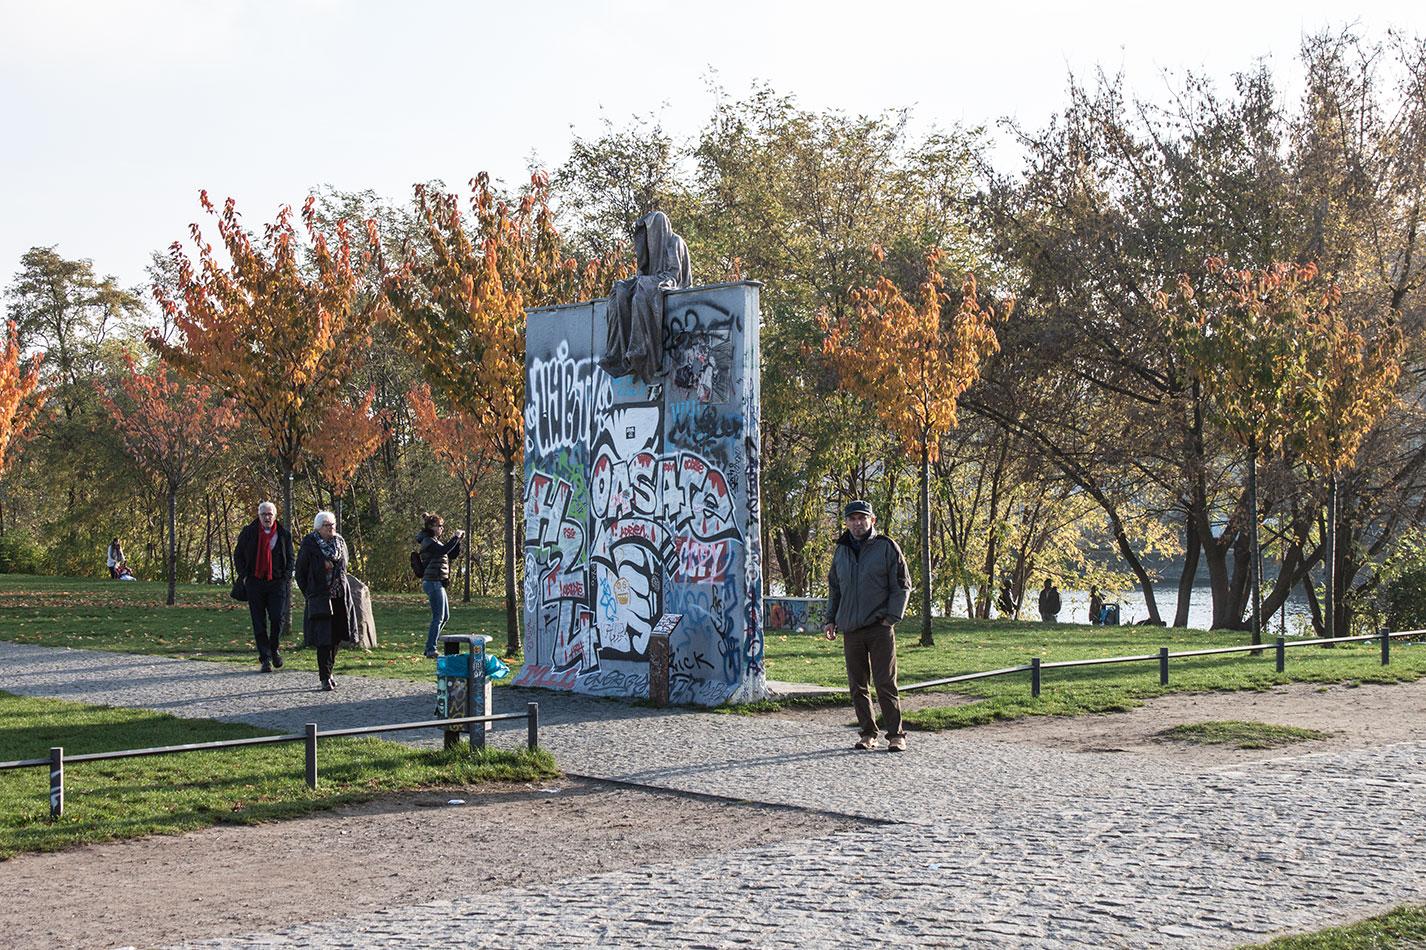 25-jears-wallfall-berlin-germany-contemporary-fine-art-show-arts-design-guardians-of-time-manfred-kili-kielnhofer-4163